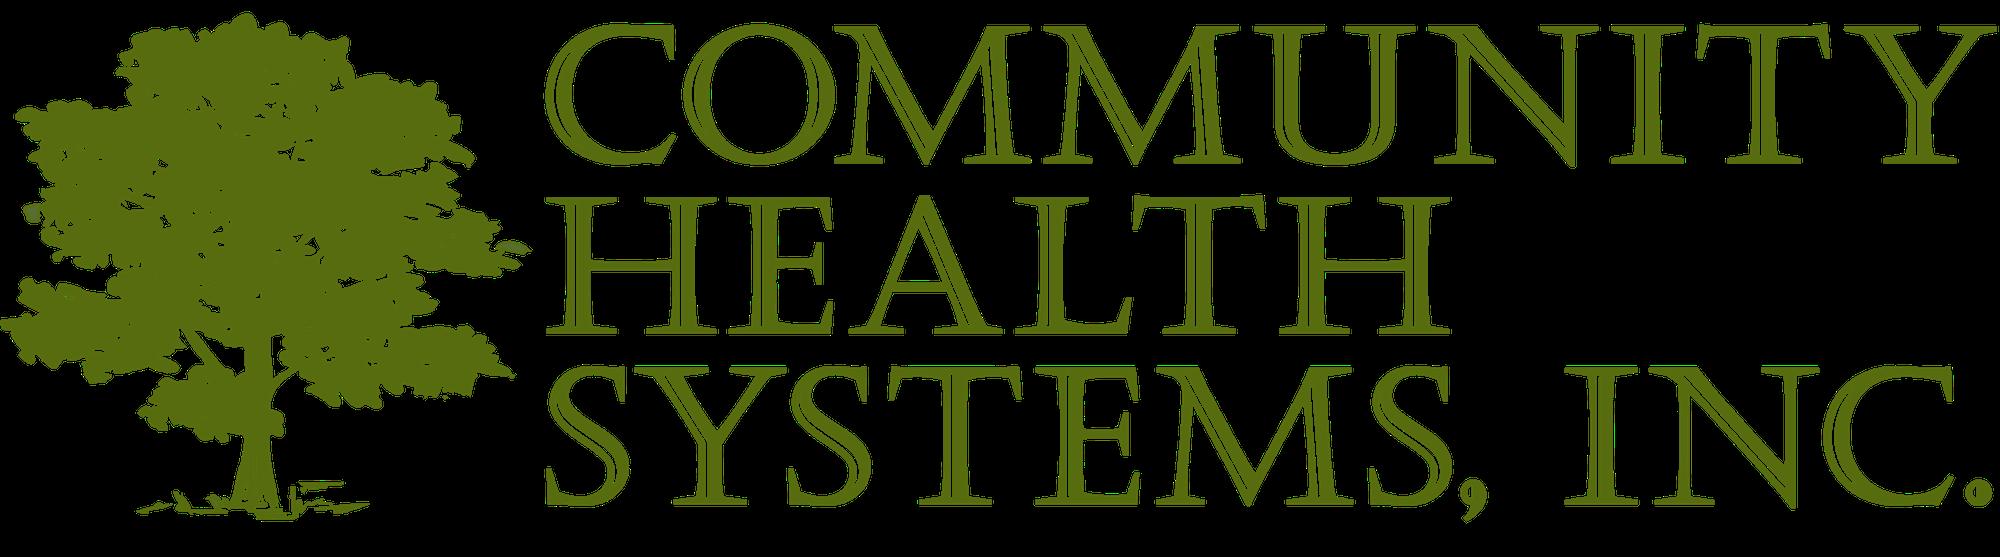 Community Health Systems - Fallbrook Family Health Center logo